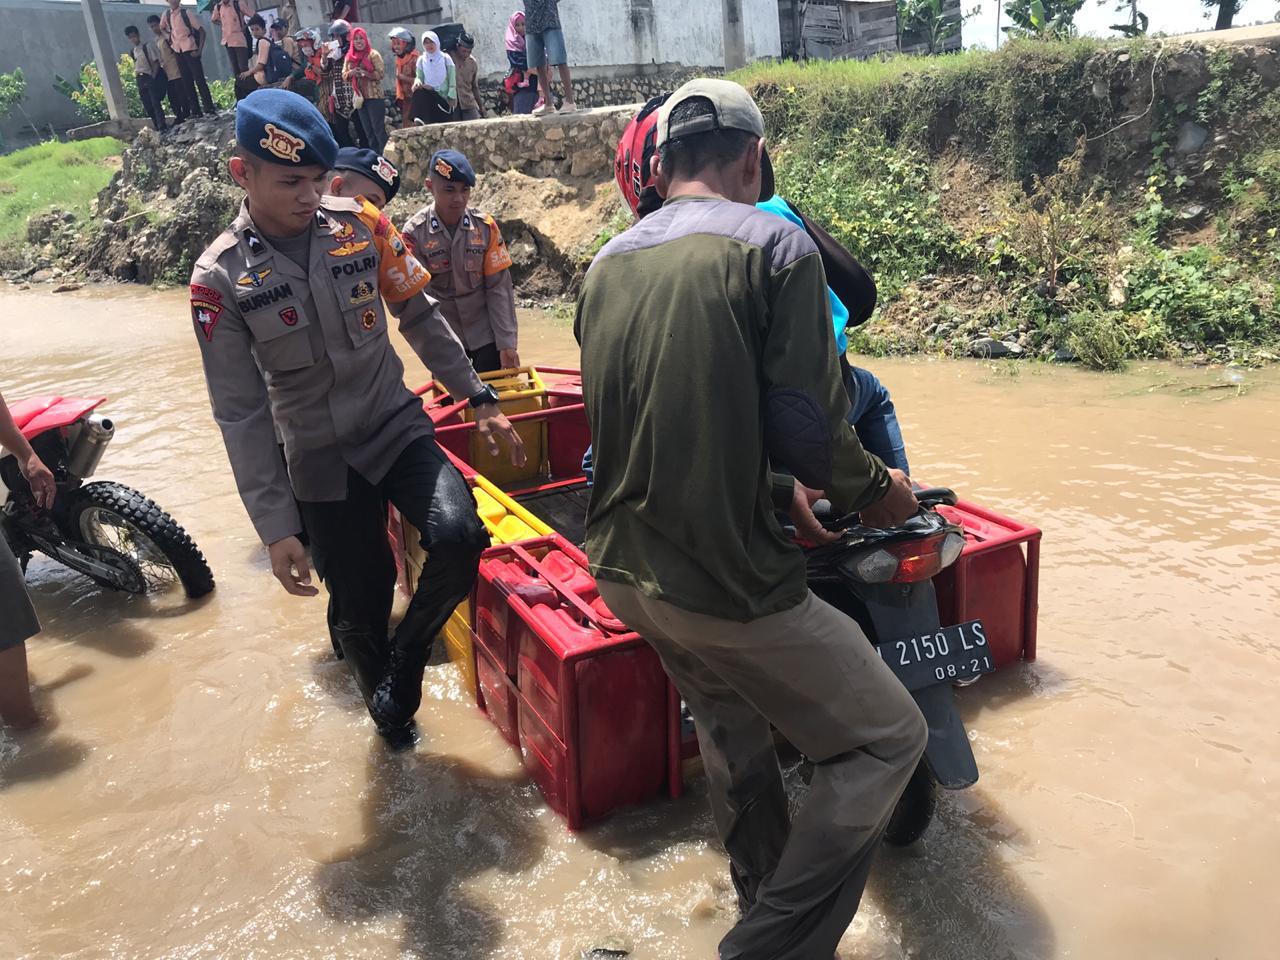 Personel Yon C Pelopor Sat Brimob Polda Sulsel Bantu Kelancaran Lalin di Pammana